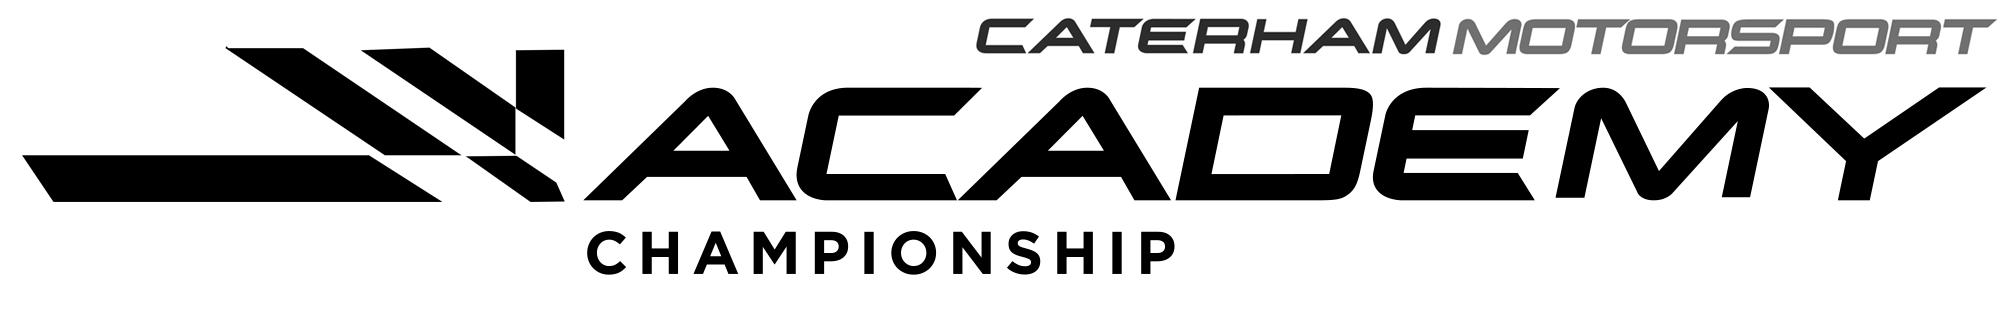 00 academy motorsport championship.png